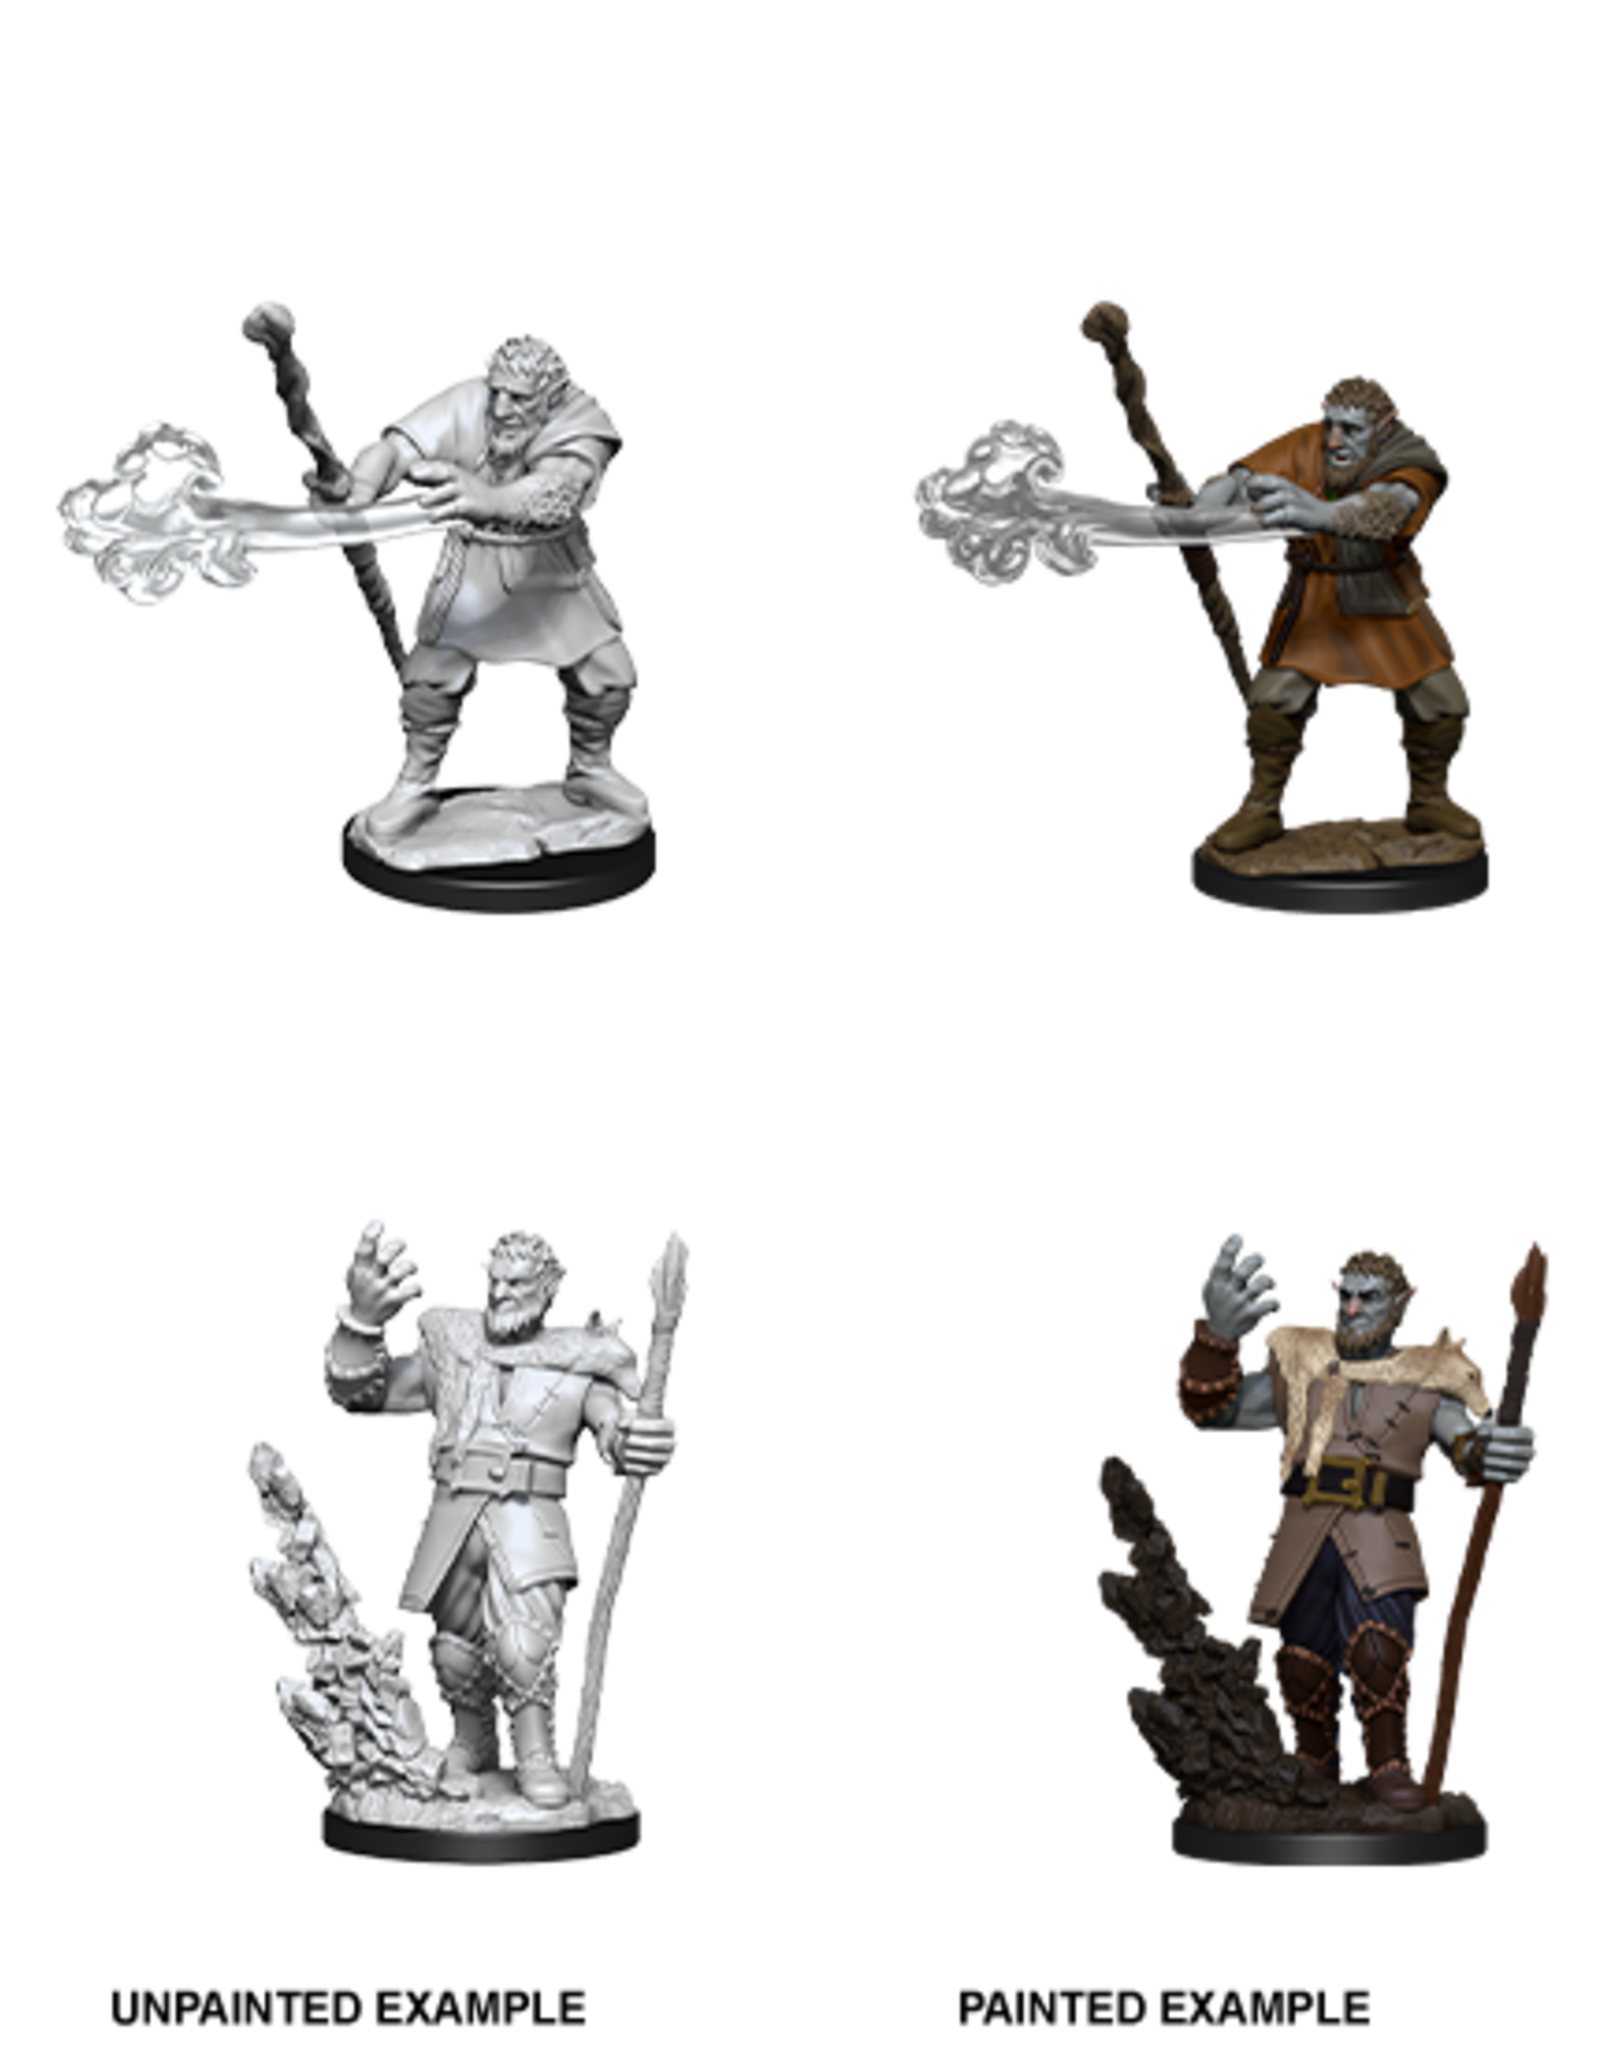 Nolzur's Marvelous Miniatures D&D D&D NMU - Firbolg